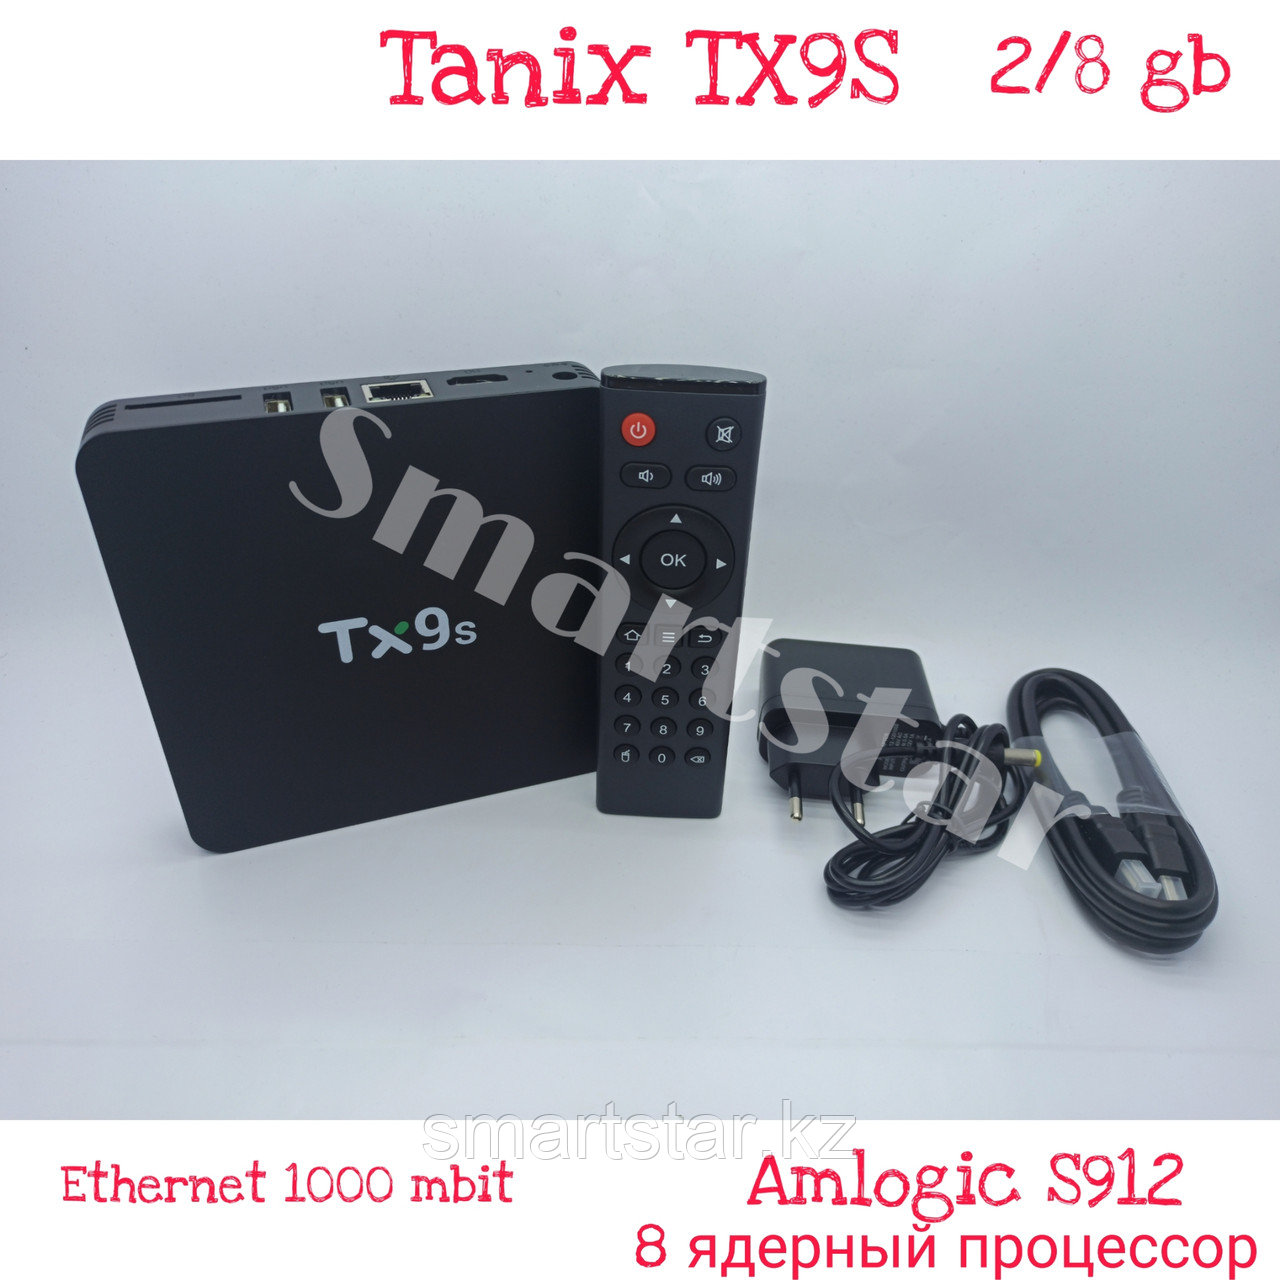 Tanix TX9S 8 ядерный s912, lan 1000 мбит android tv box